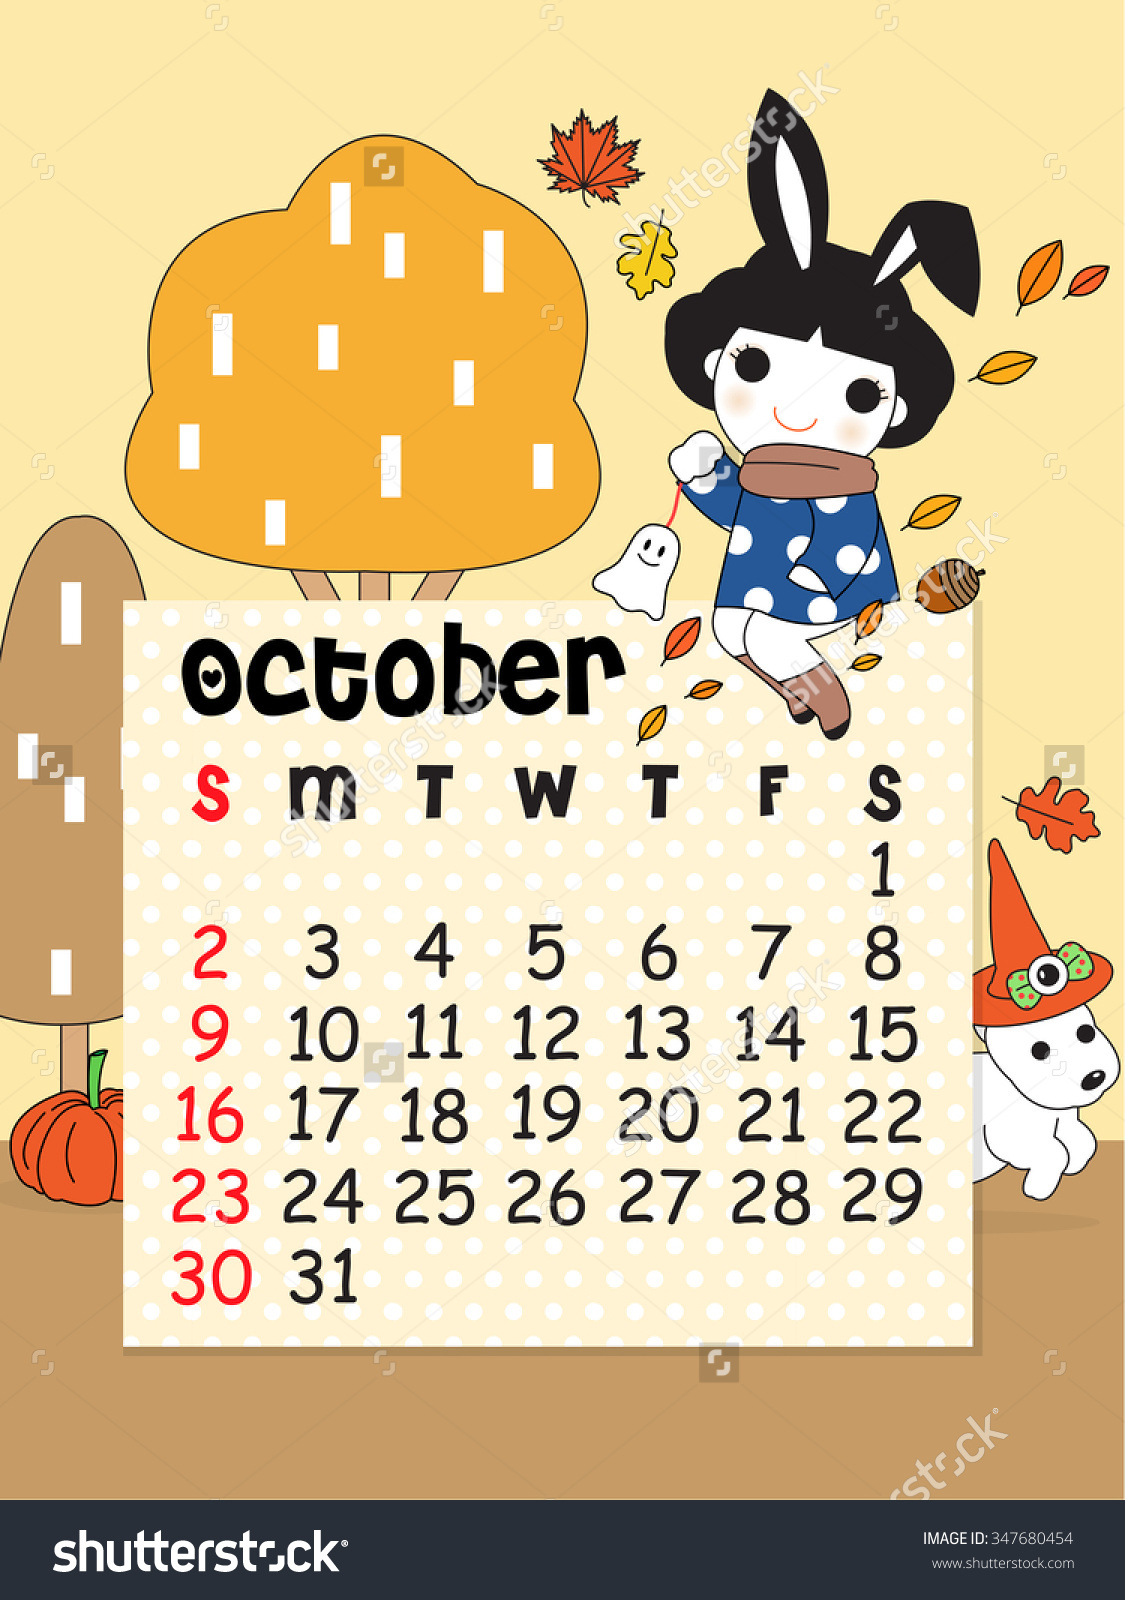 Cute october 2016 clipart. Calendar template character illustration